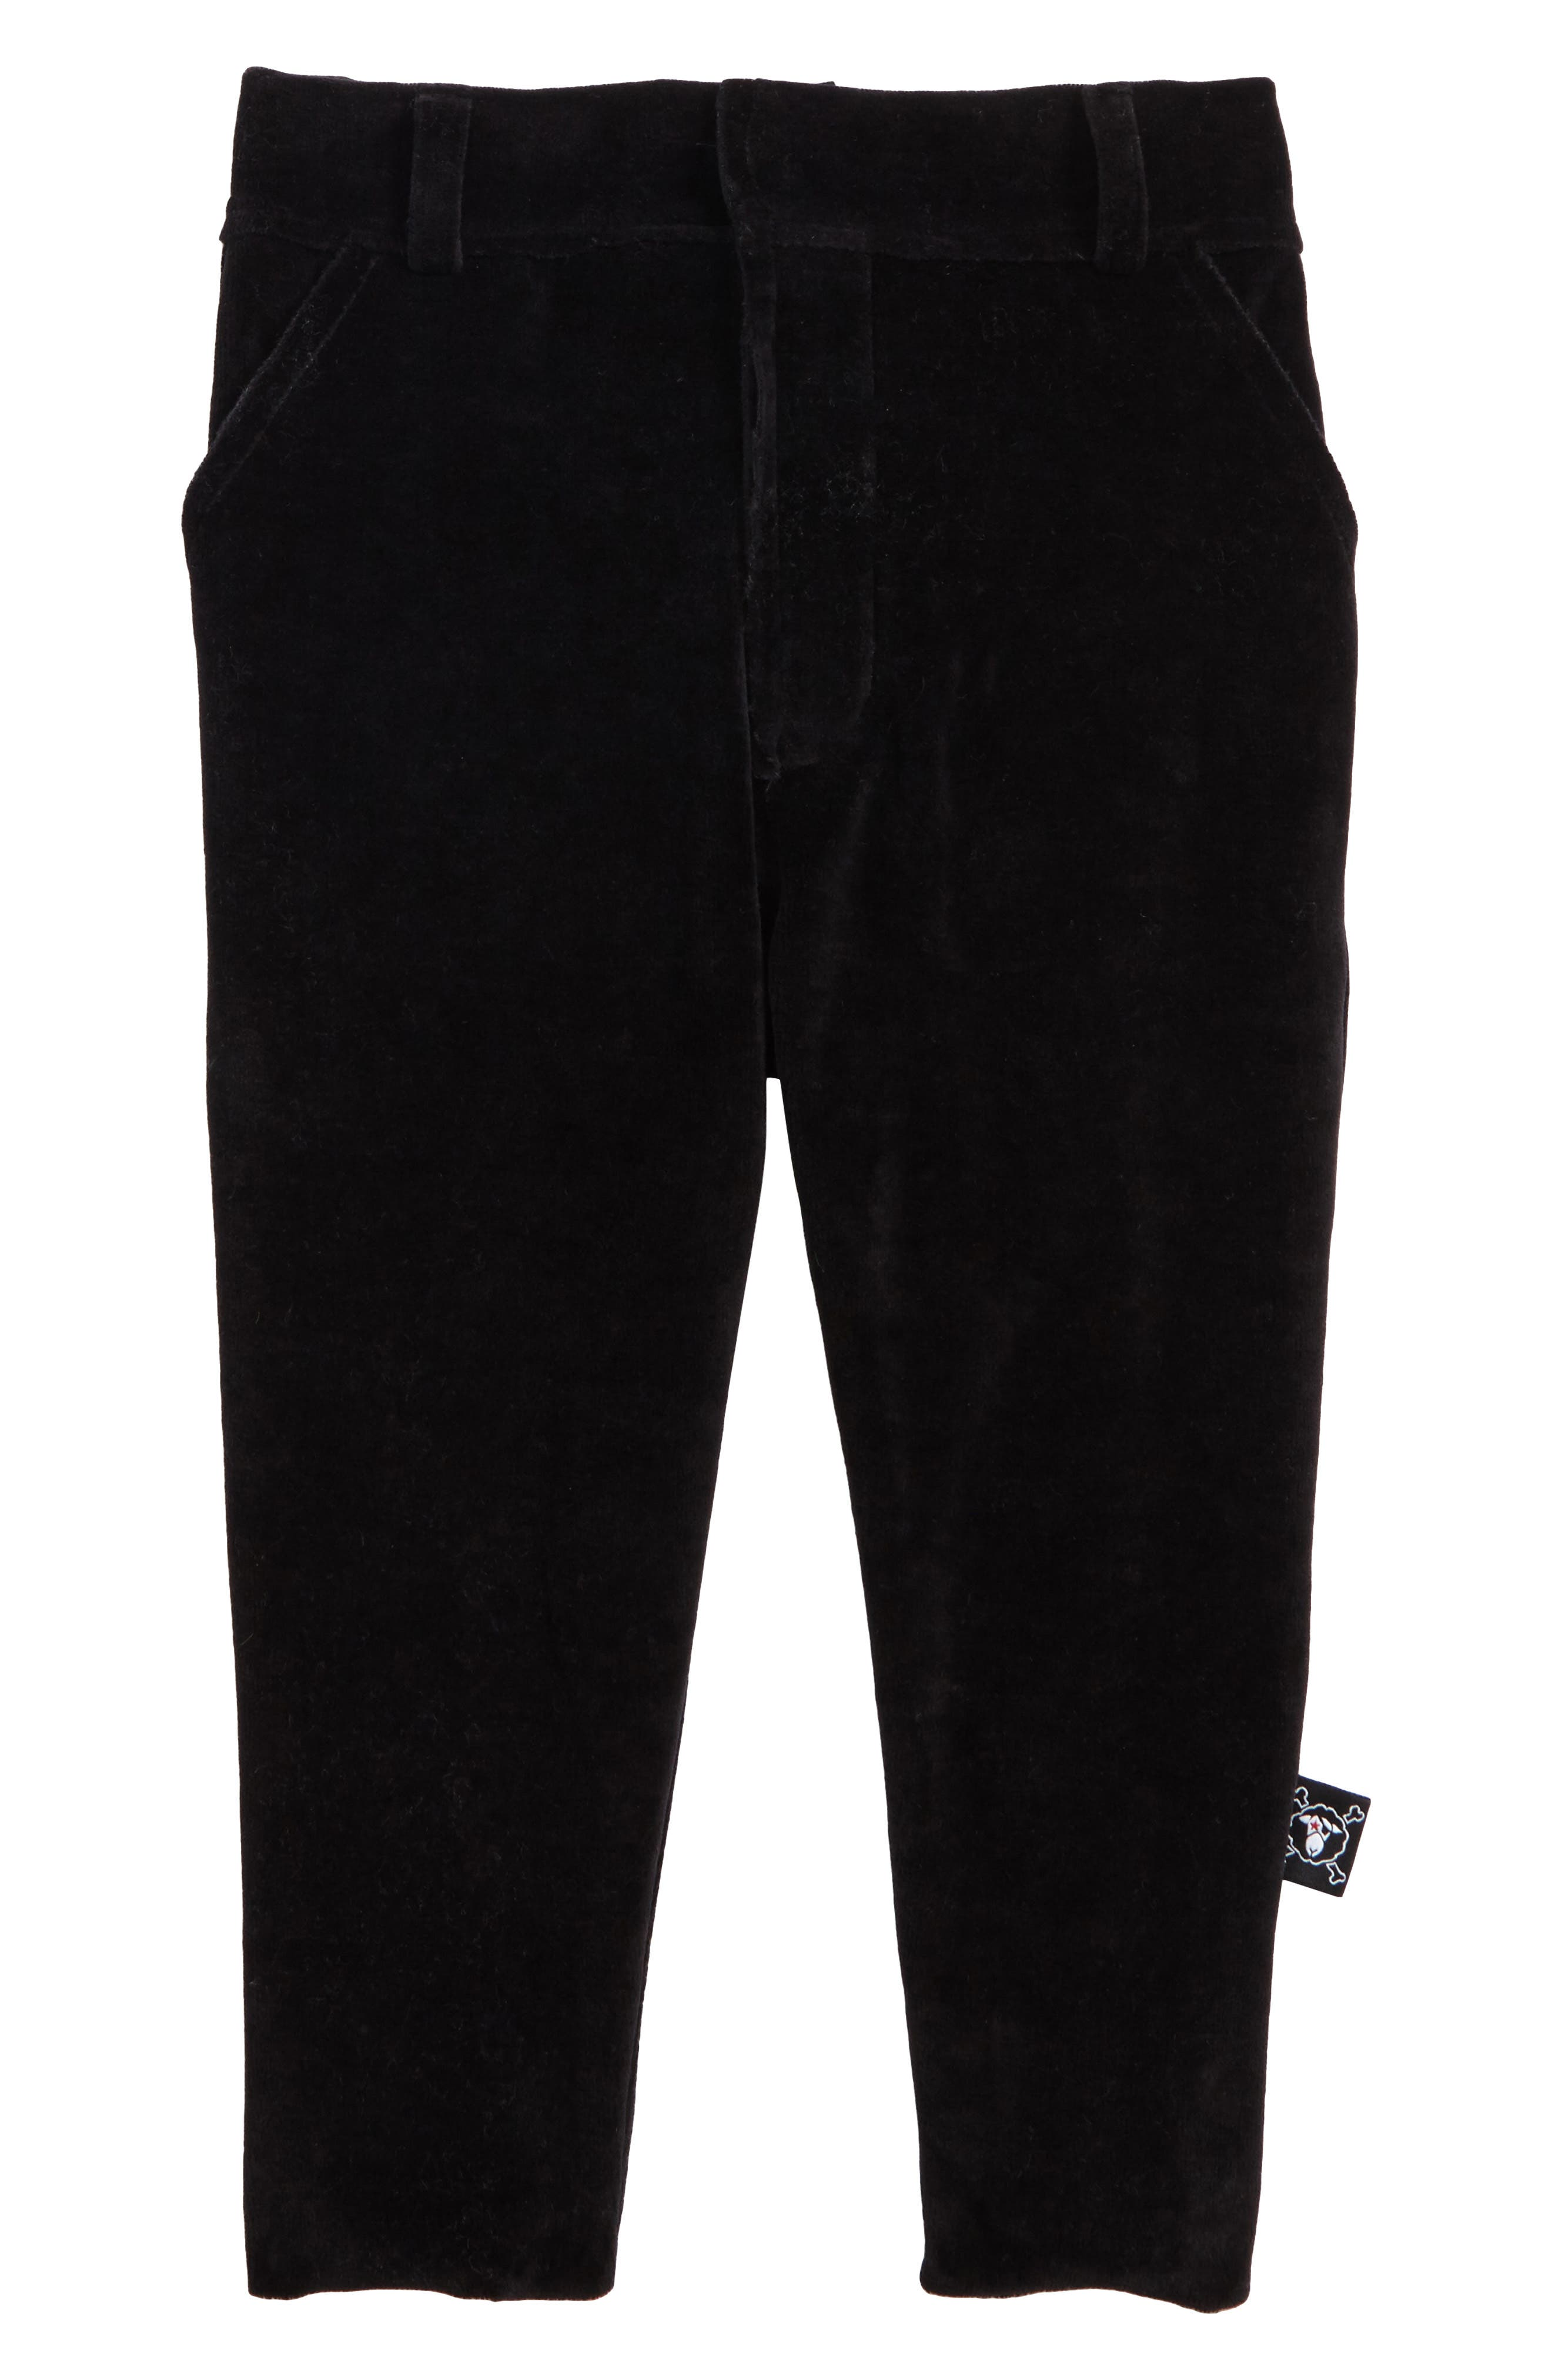 Velvet Pants,                             Main thumbnail 1, color,                             Black